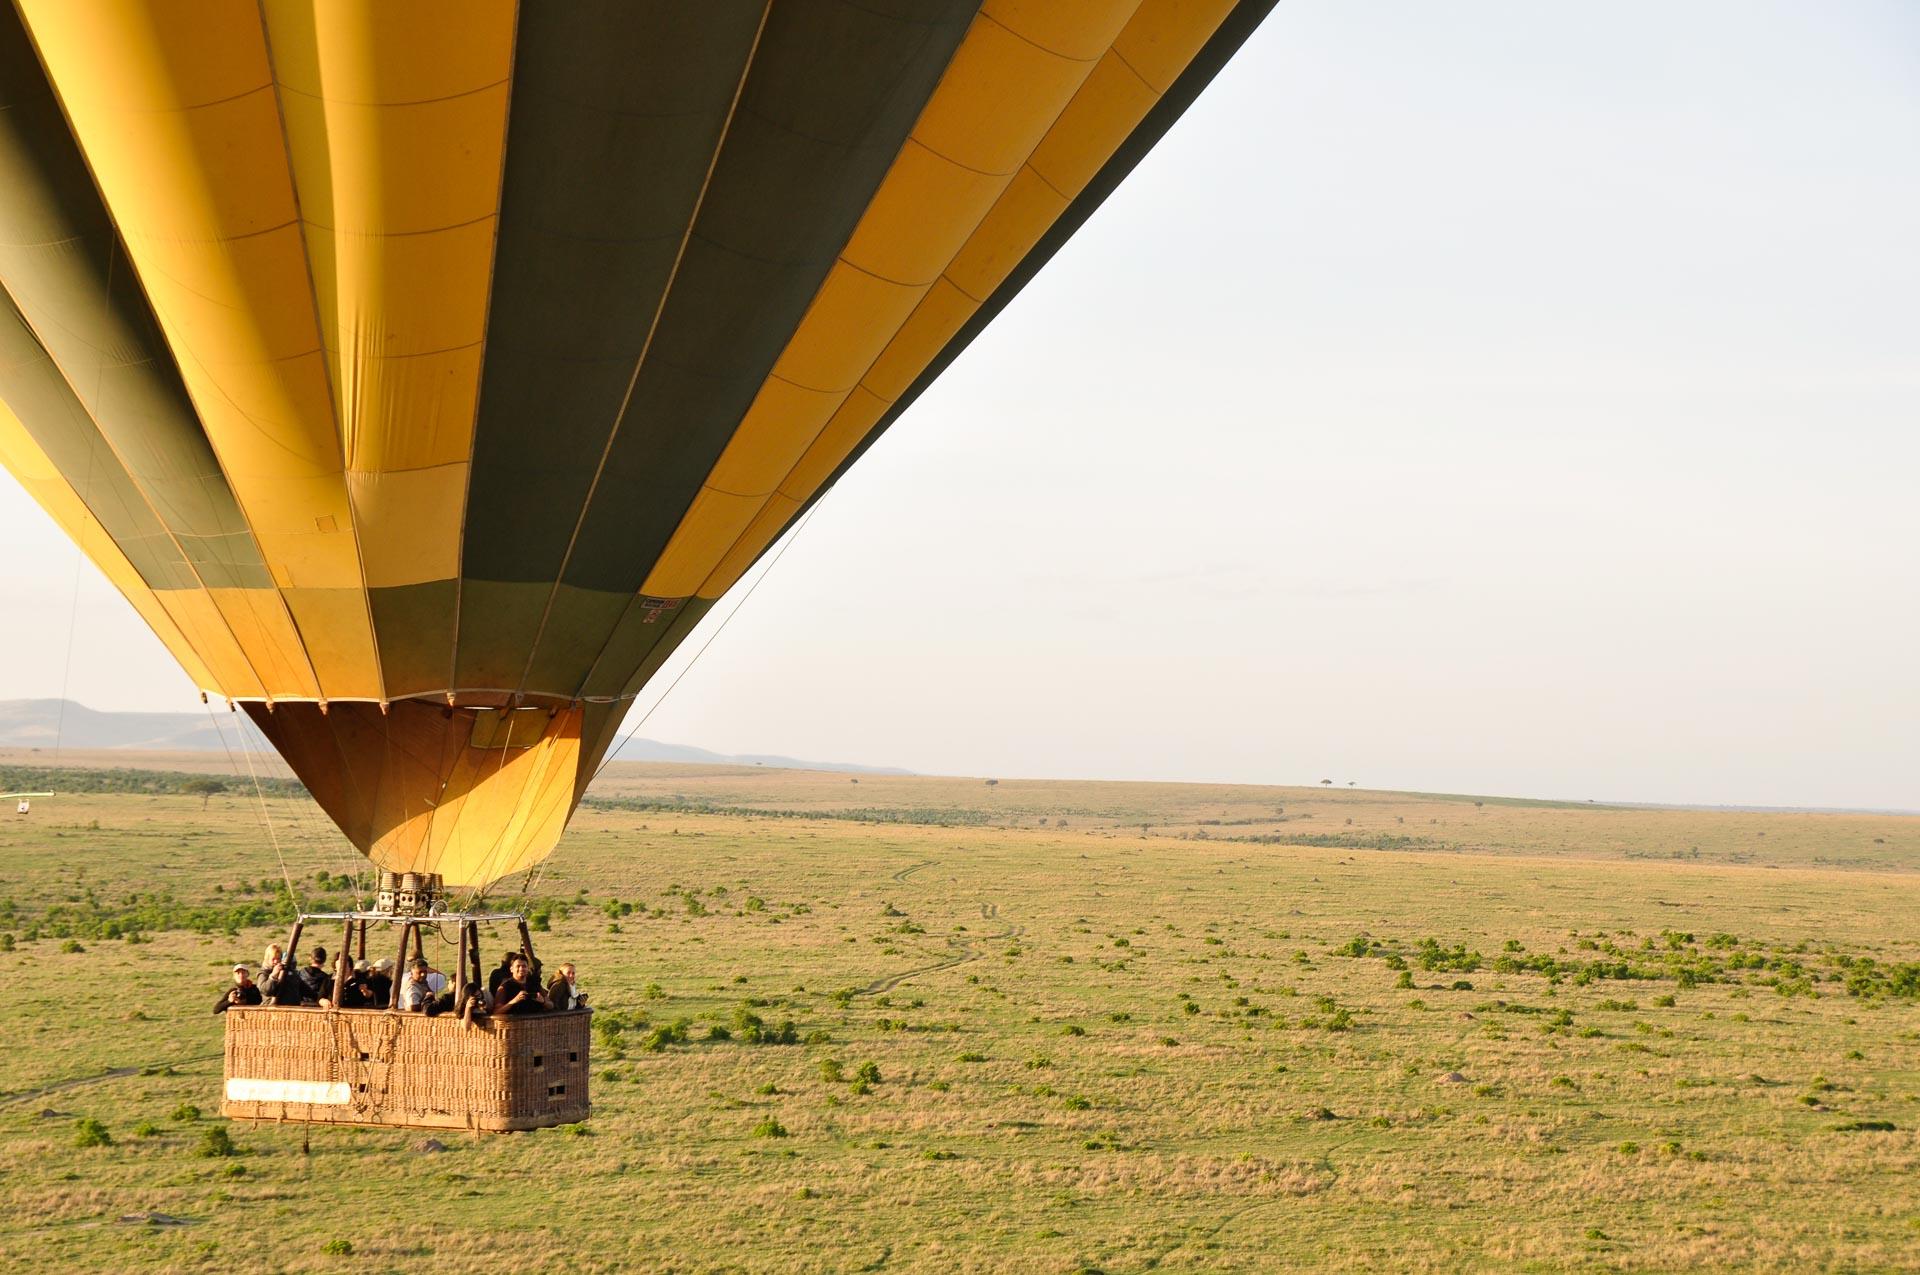 Masai-Mara-Ballonfahrt-Kenia-Globetrotter-Select-14